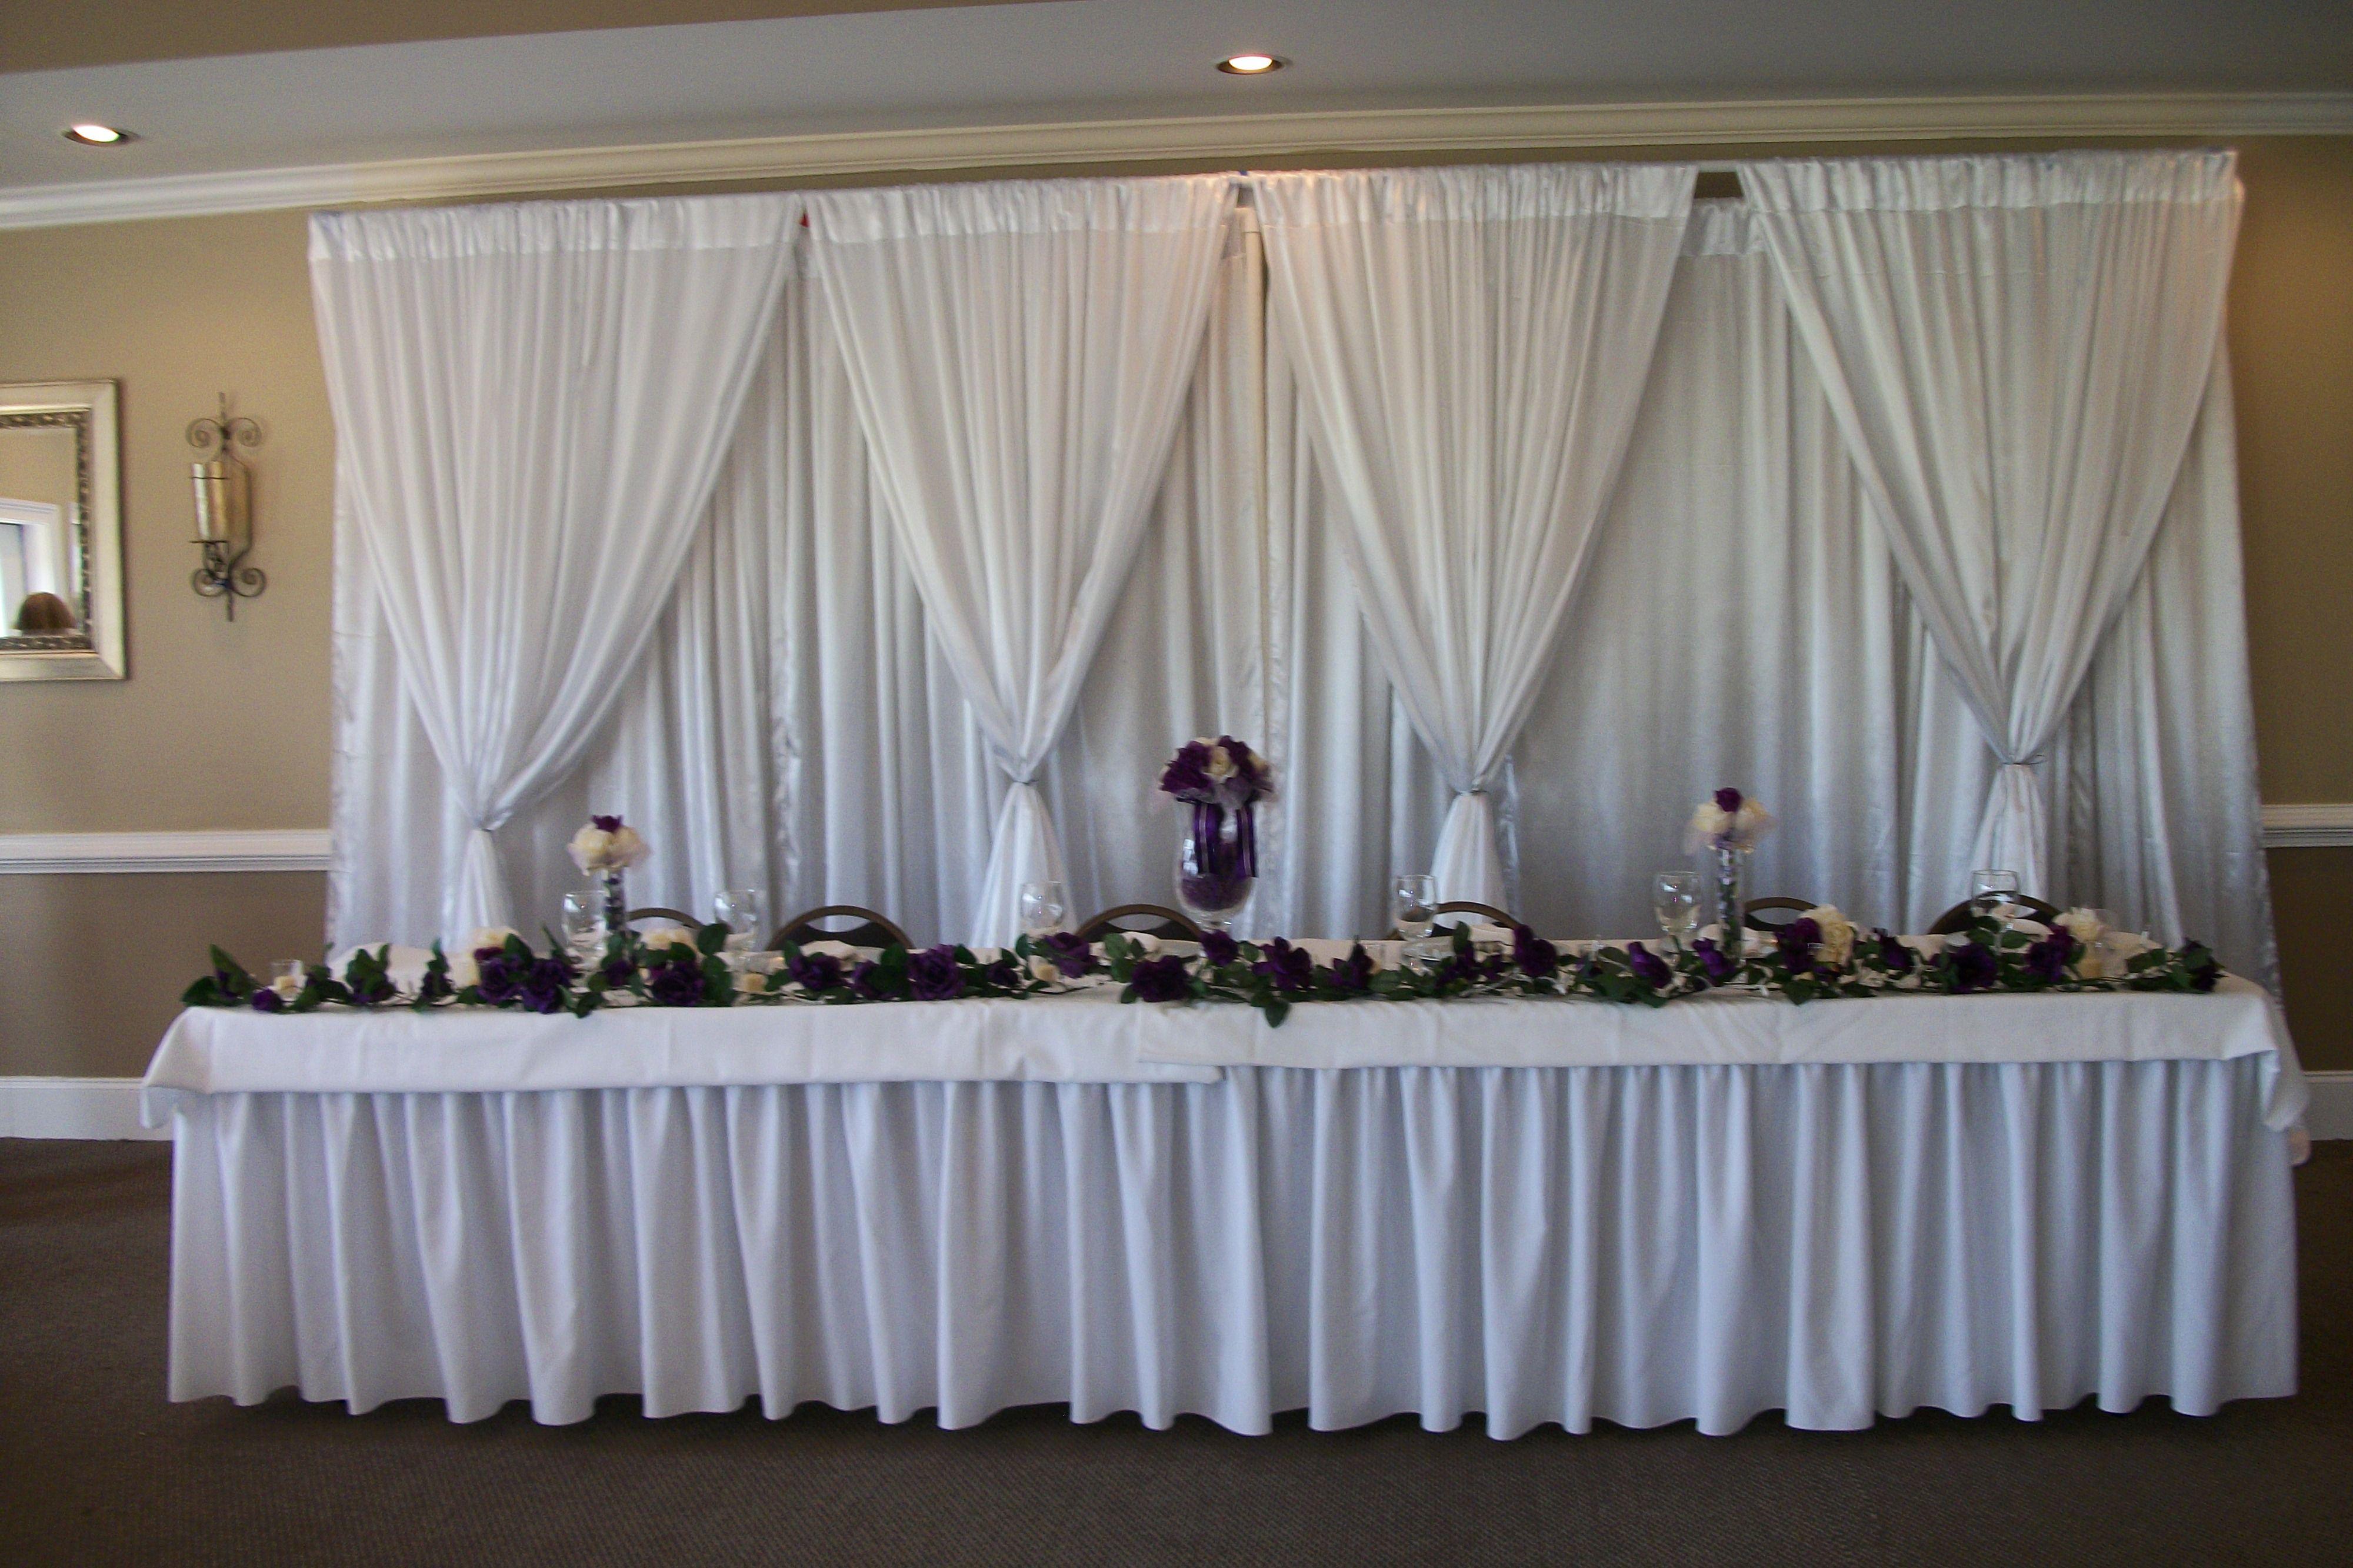 Bride and groom table wedding plan ideas pinterest